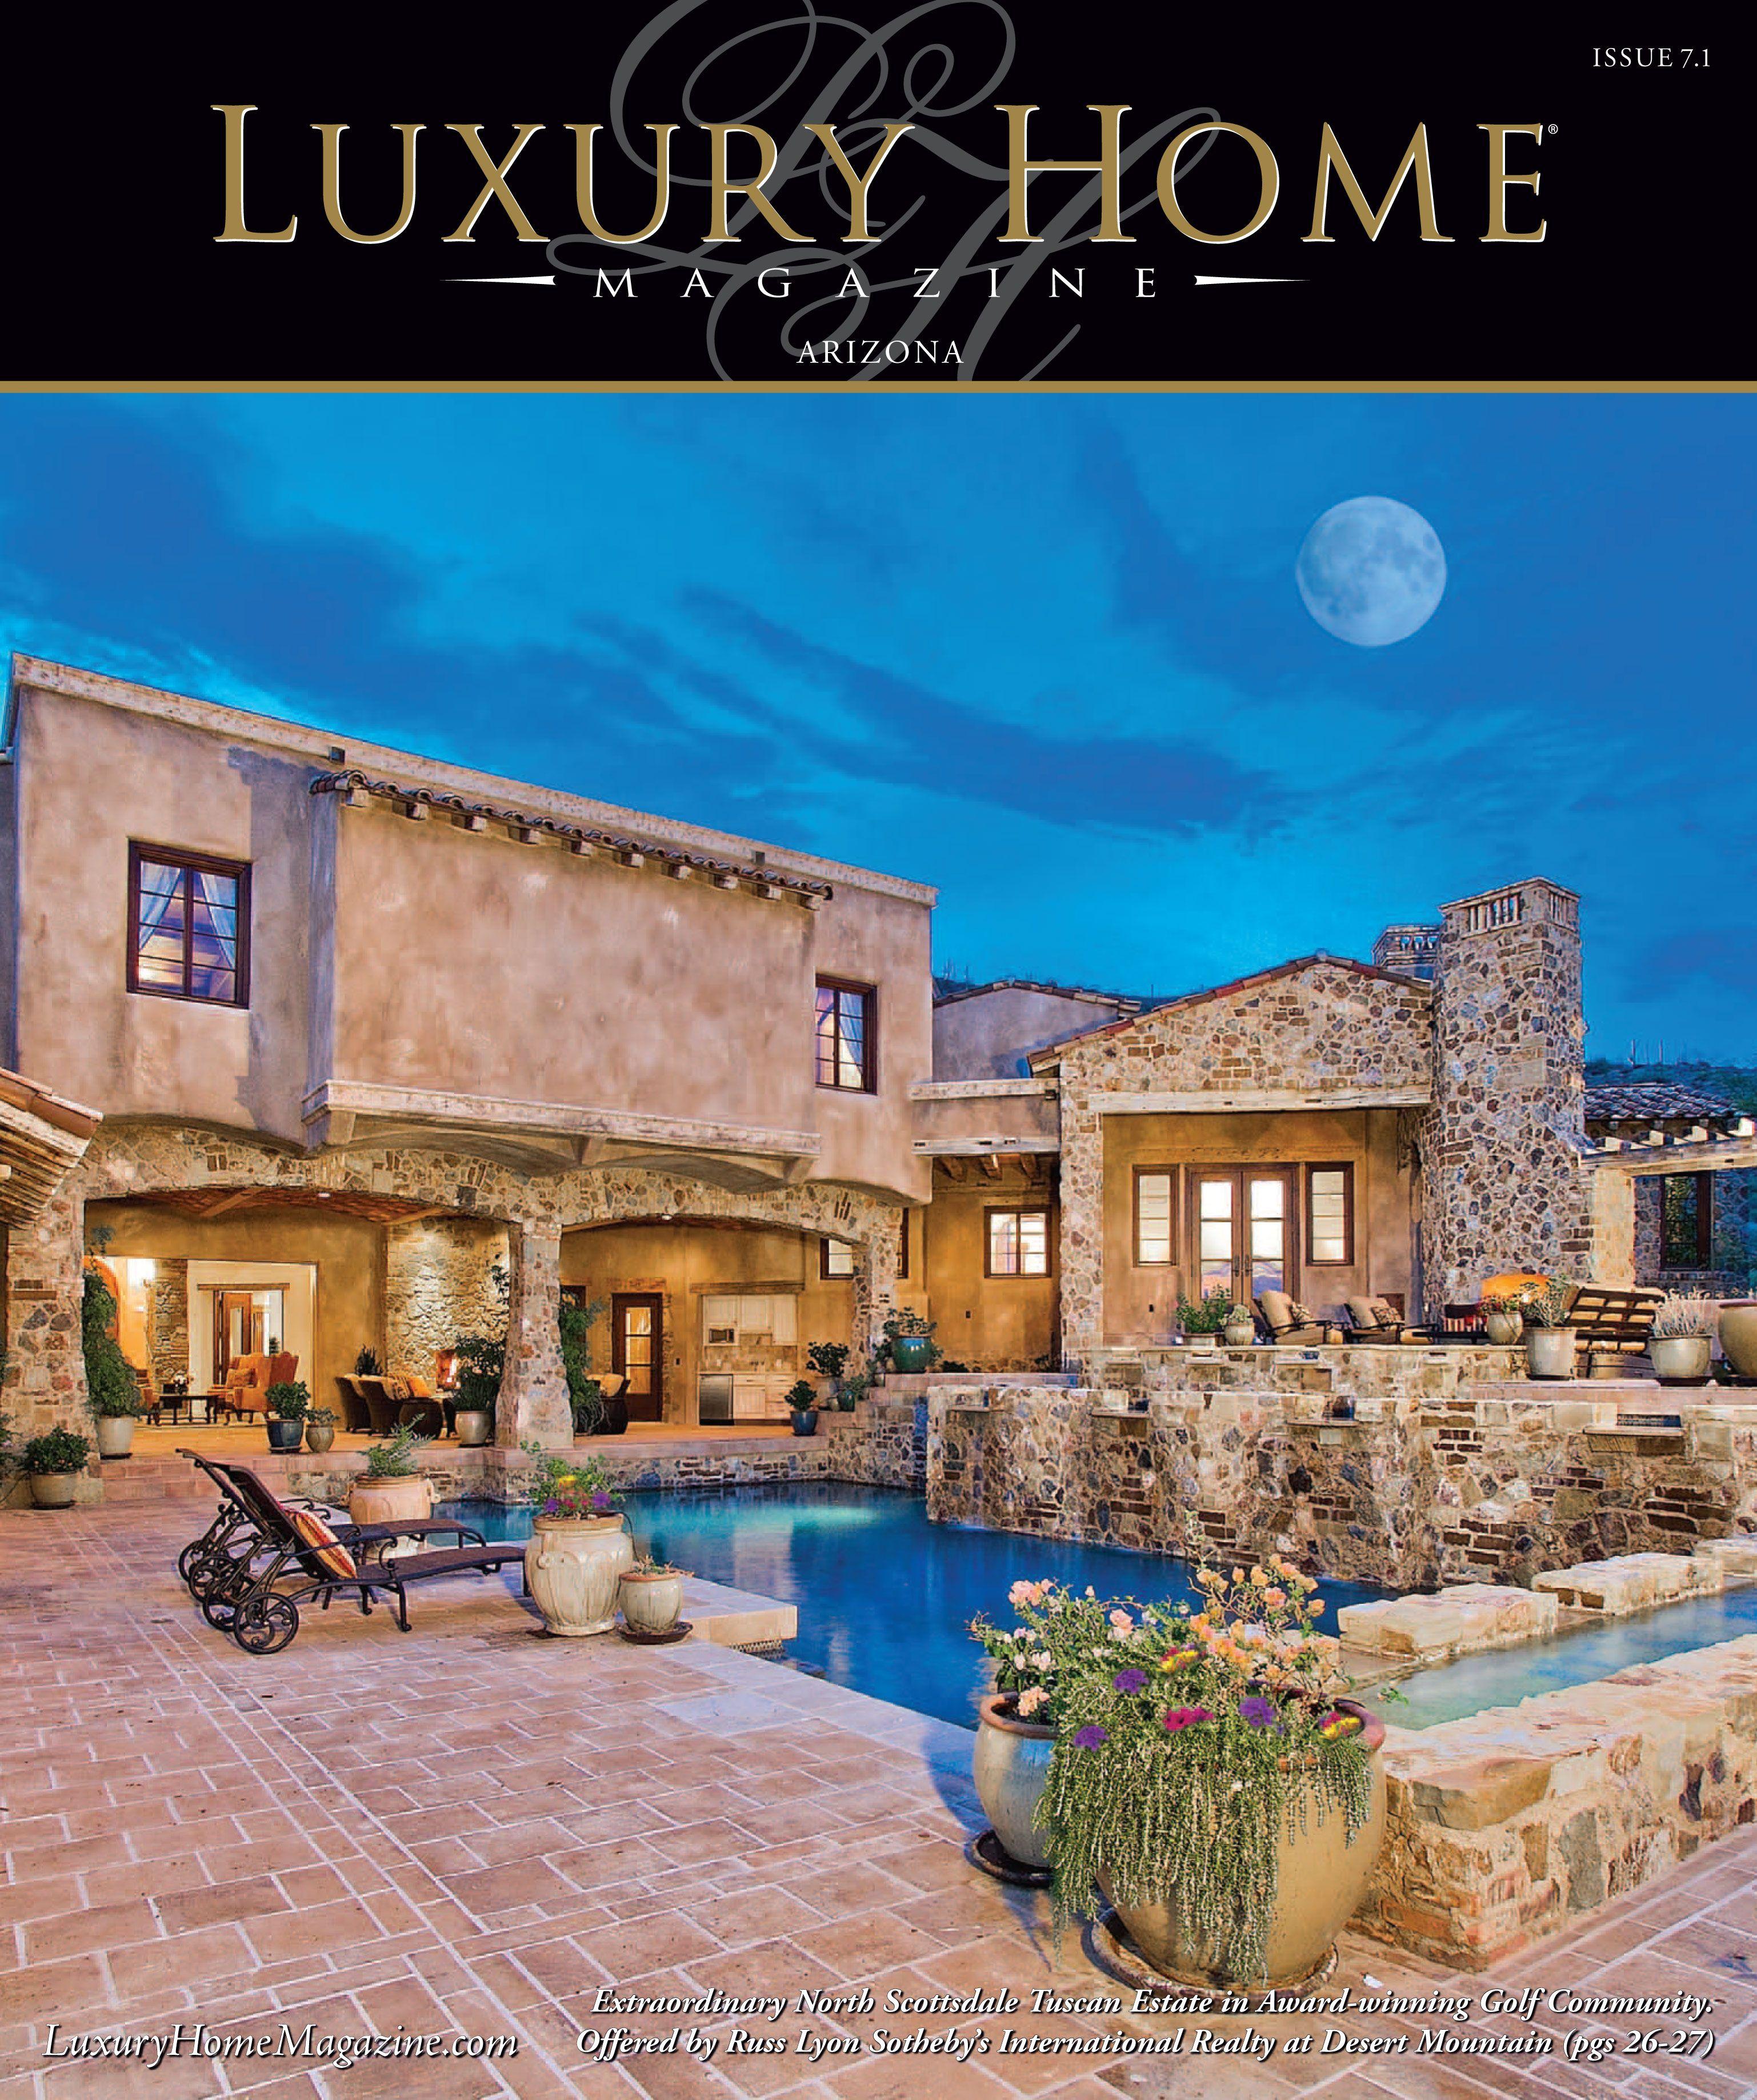 Luxury Home Magazine Arizona Issue 7.1 Cover Photography